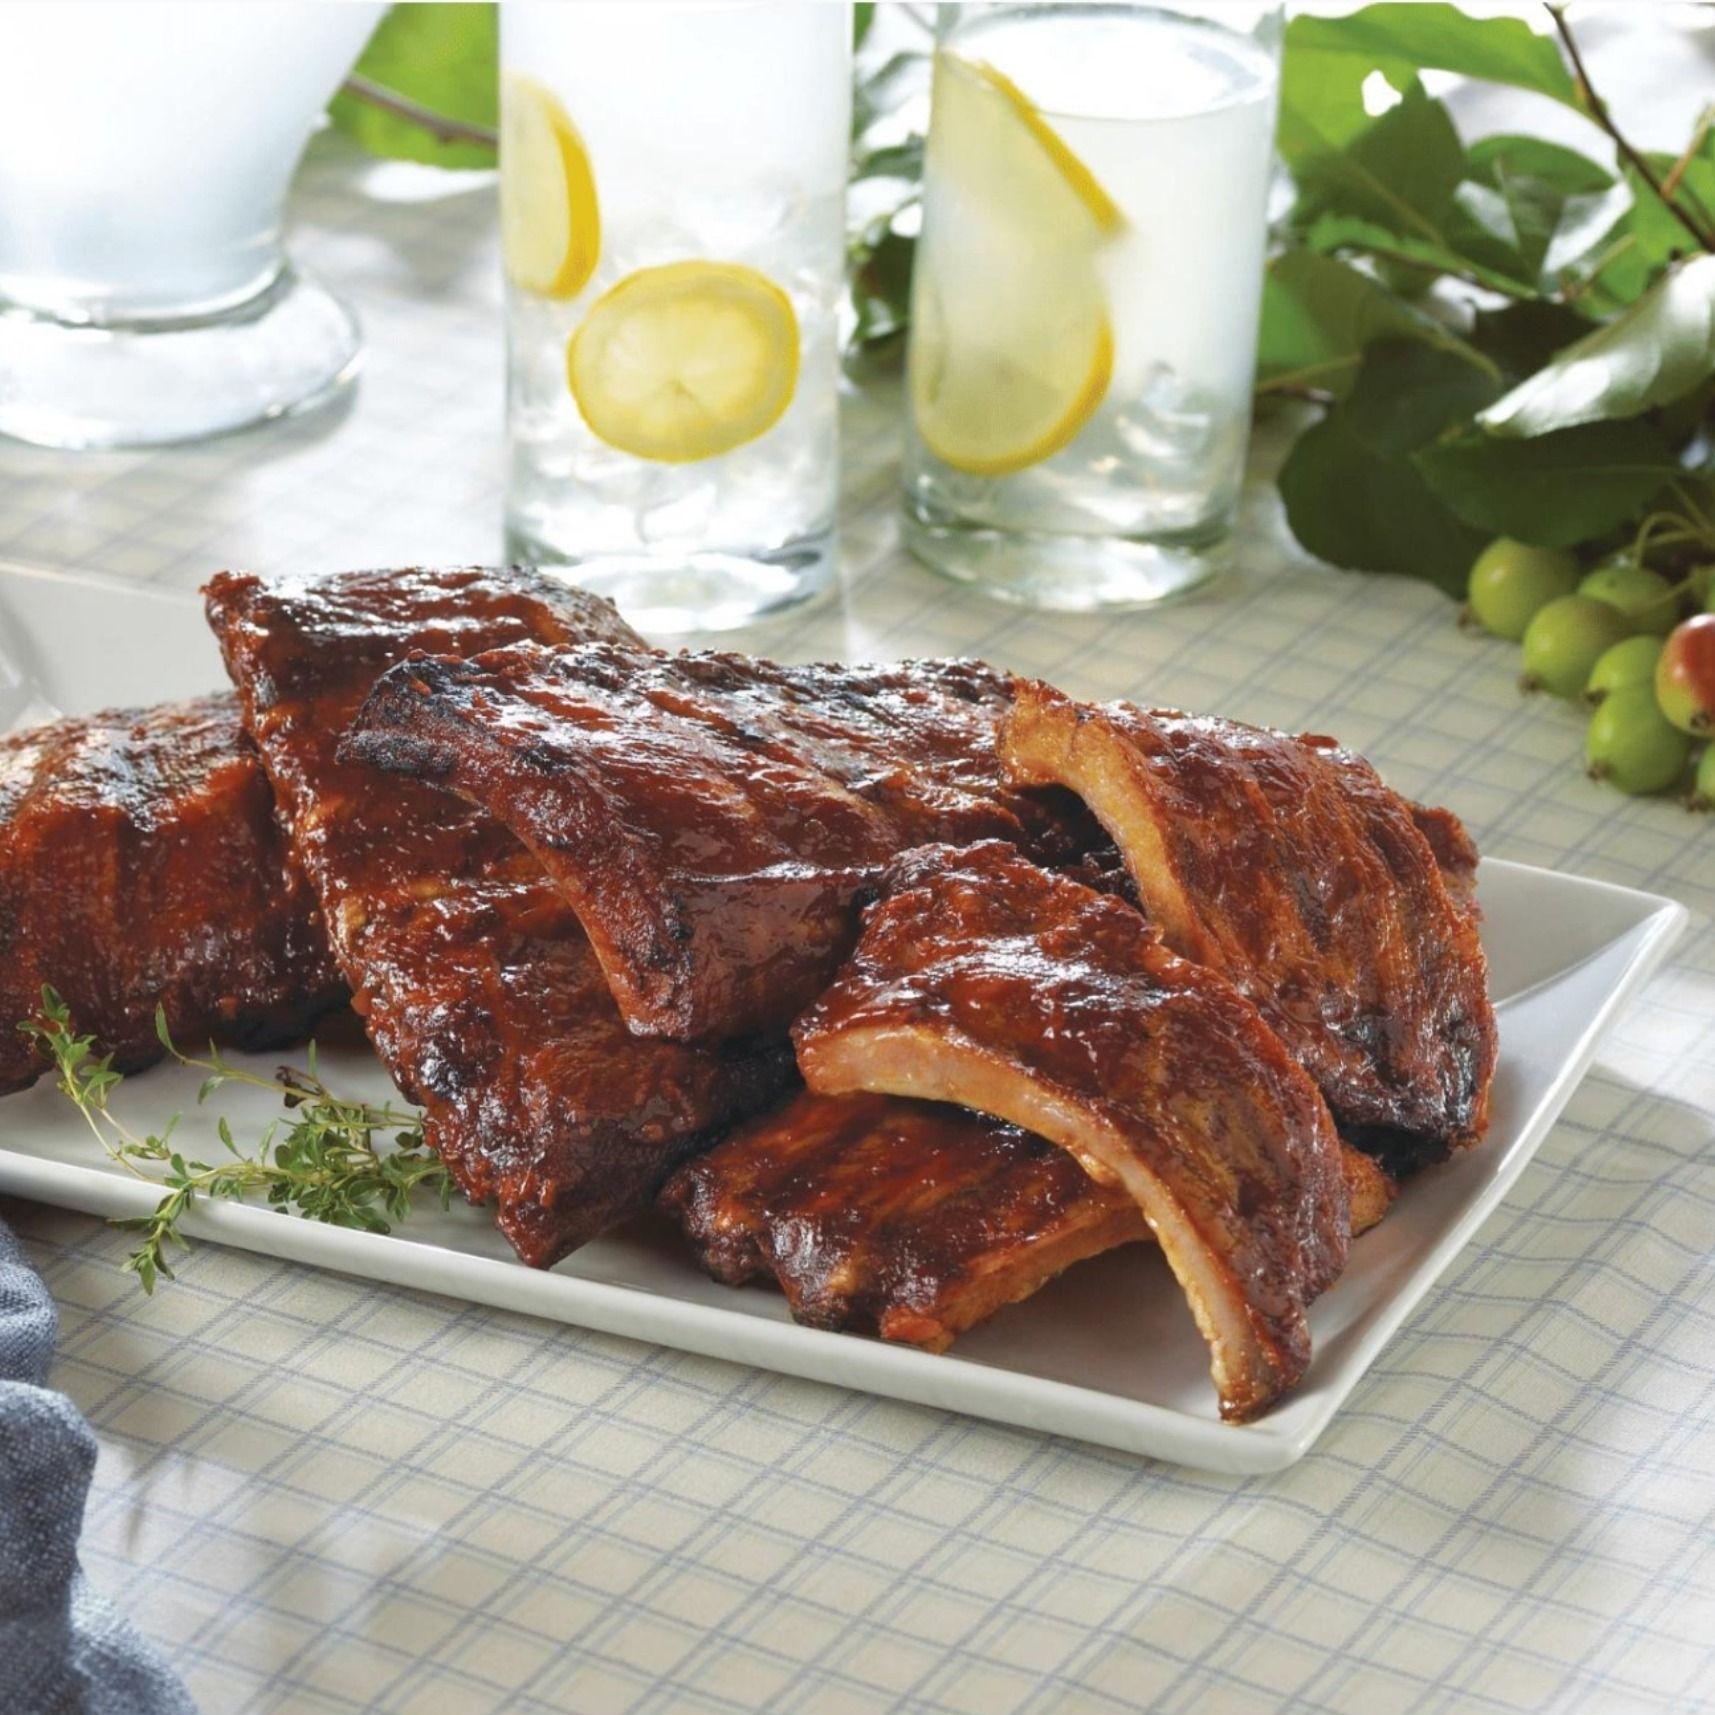 Fall Off The Bone Baby Back Ribs Pork Ribs Barbecue Pork Ribs Bbq Pork Ribs